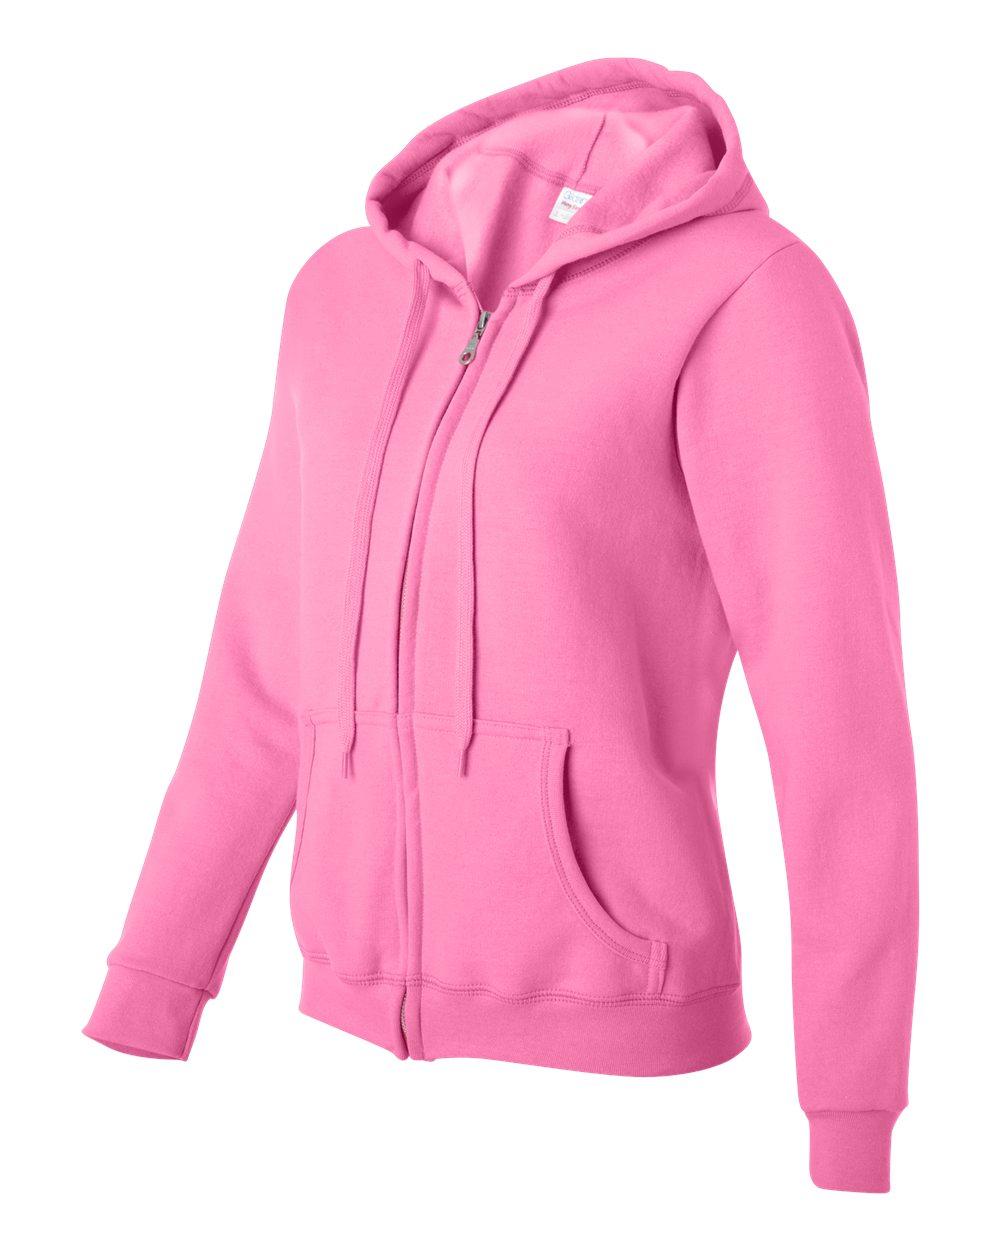 f59cb93ee01 Gildan – Heavy Blend Women s Full-Zip Hooded Sweatshirt – Goodwin ...